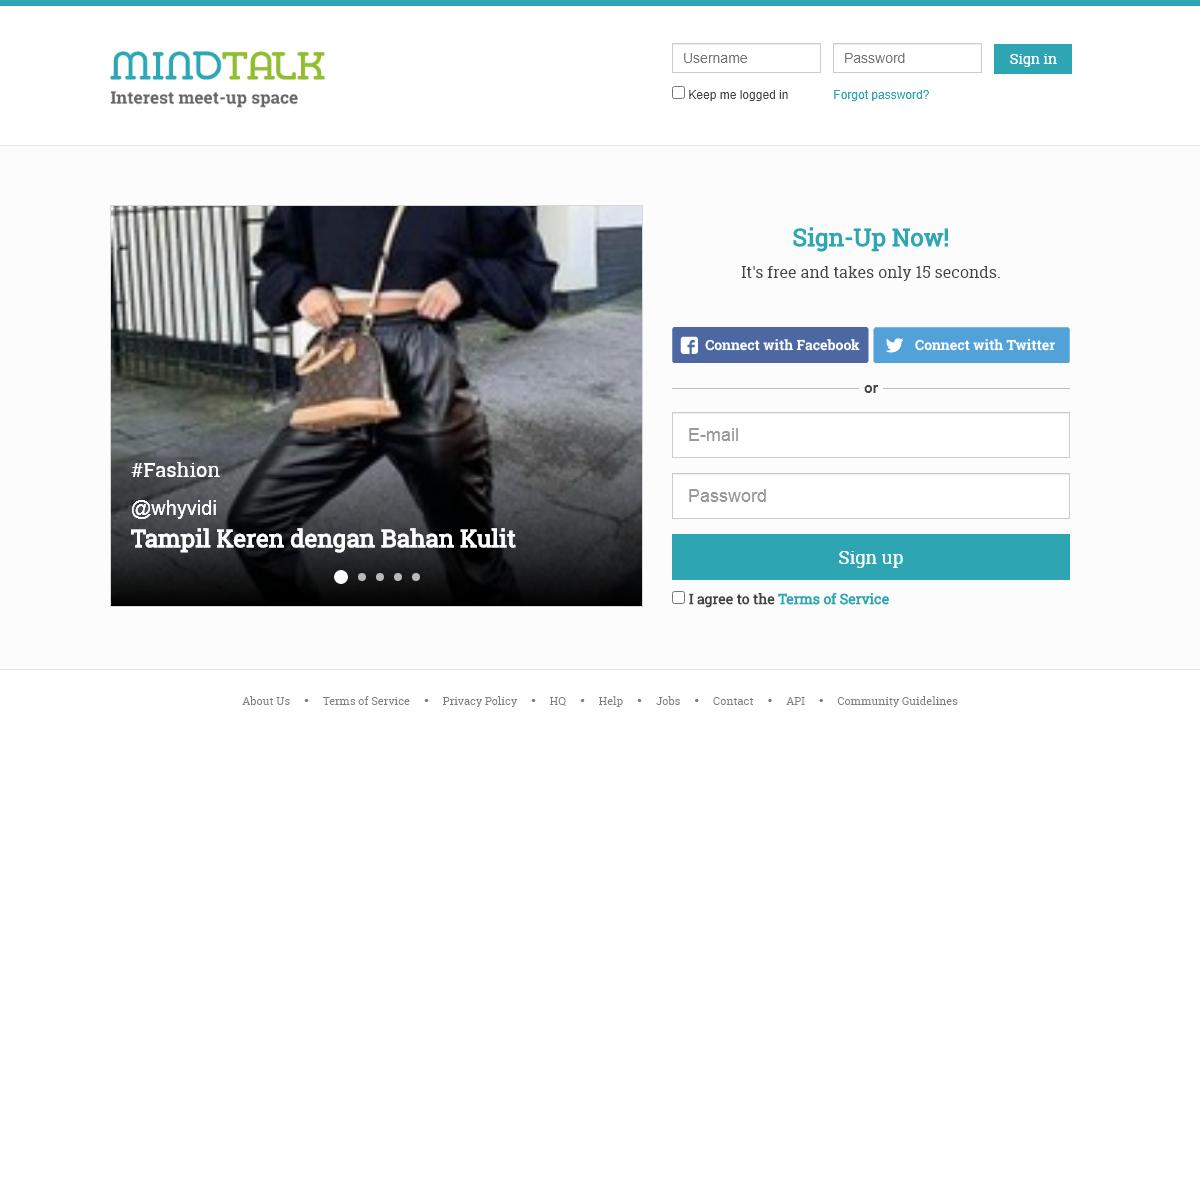 Mindtalk - Interest Meetup Space